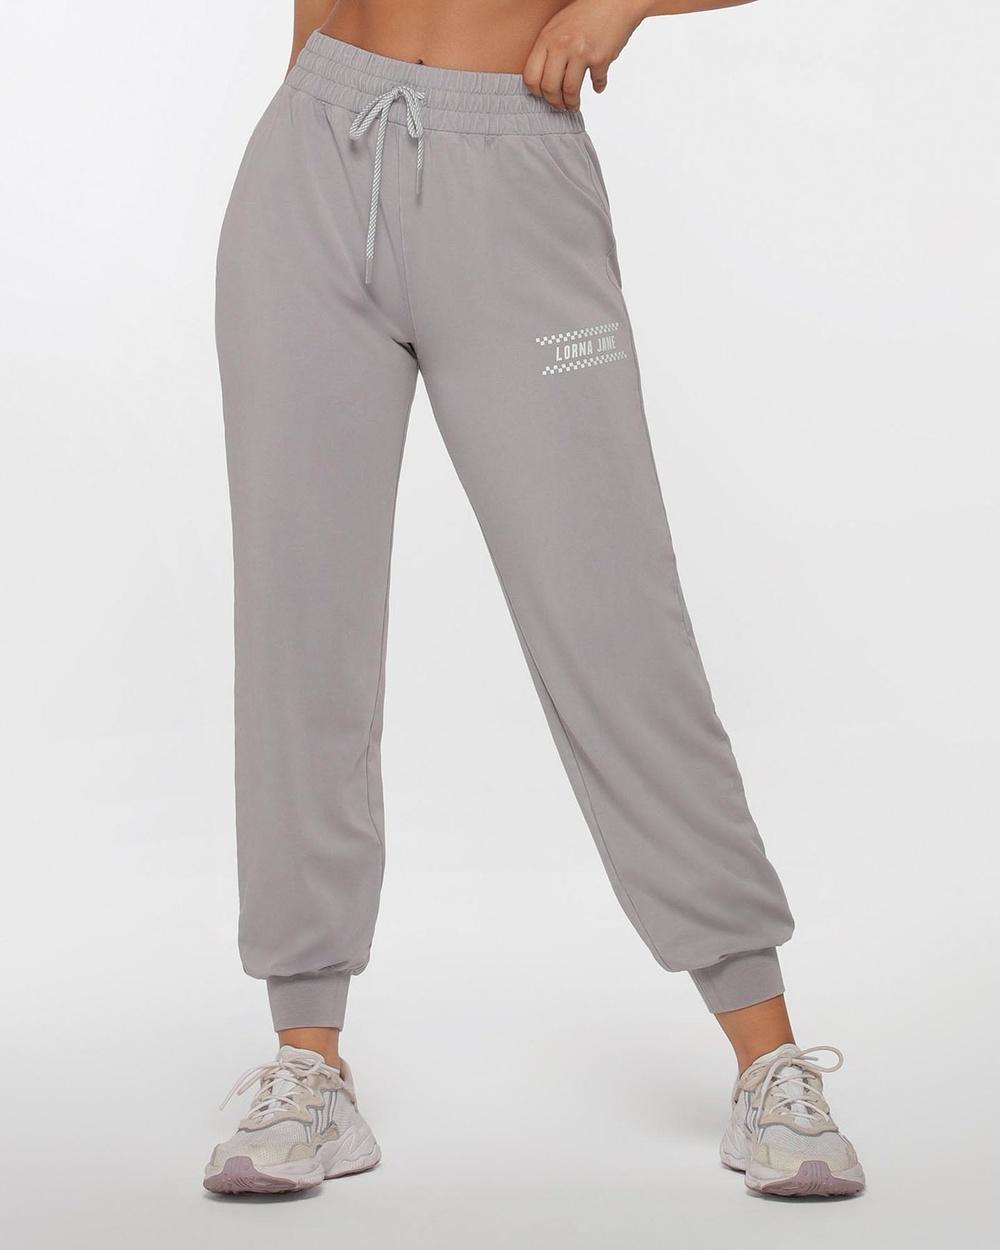 Lorna Jane All Rounder Tracksuit Pants Sweatpants Concrete Grey